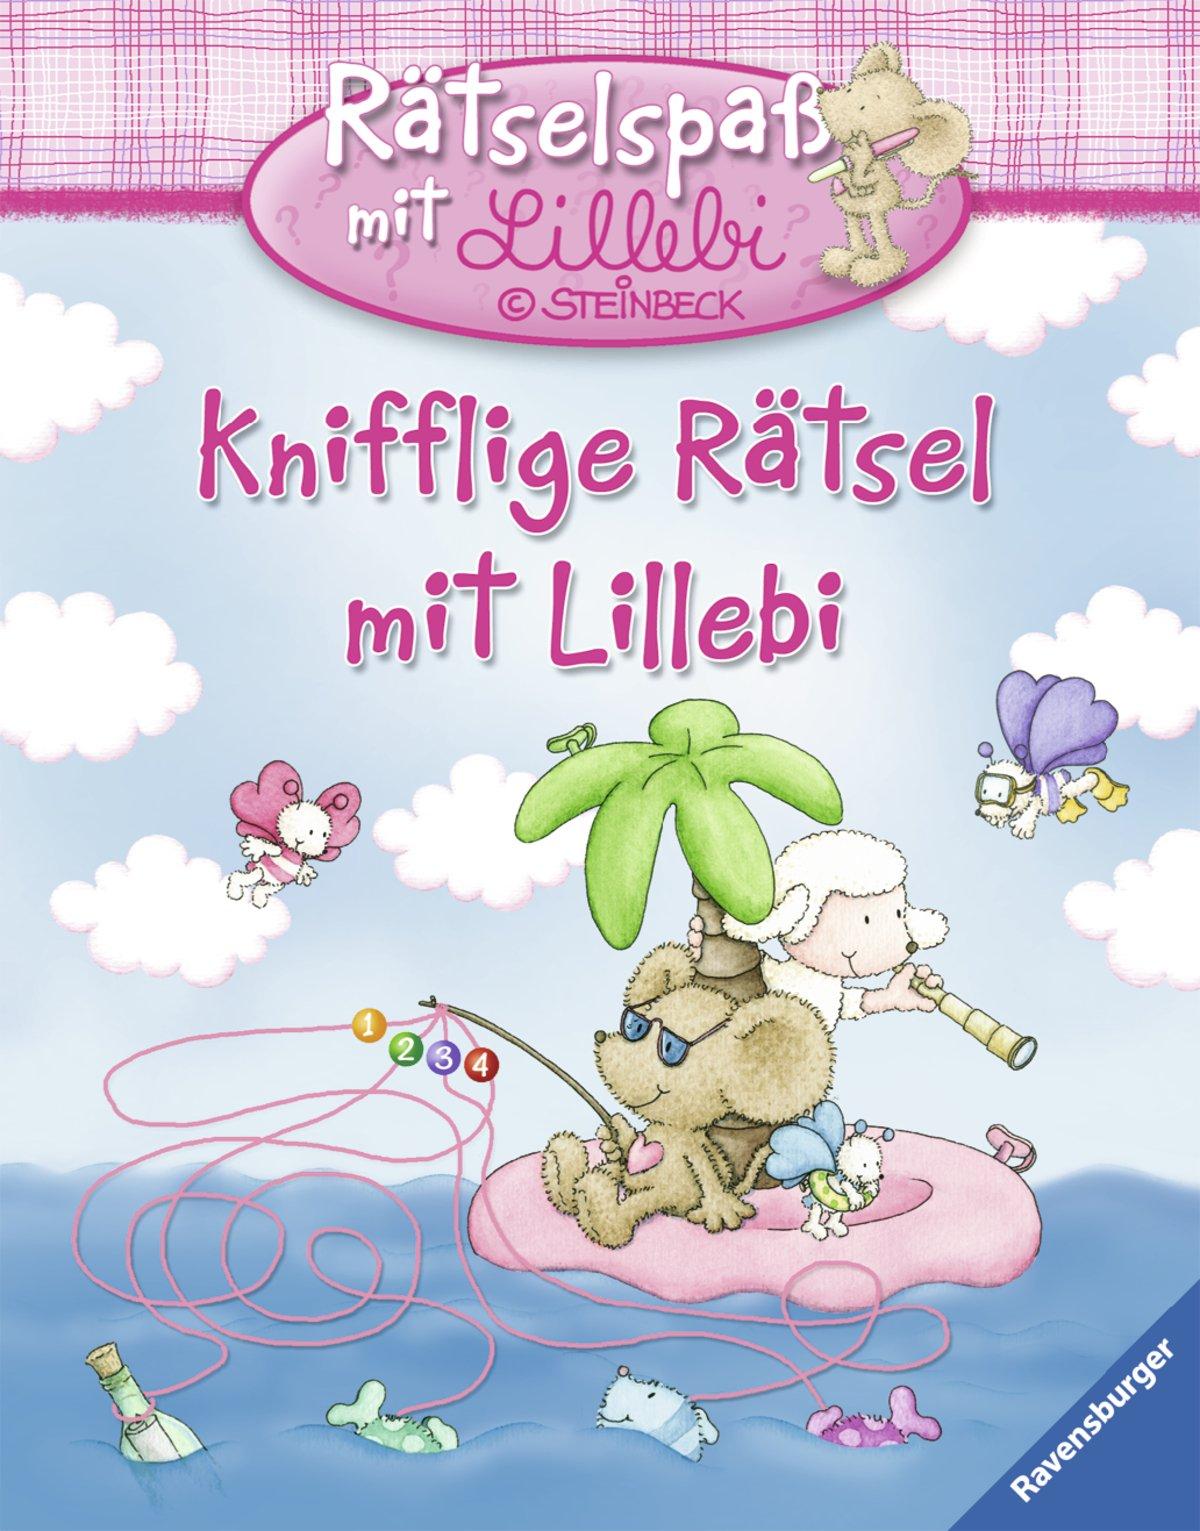 Knifflige Rätsel mit Lillebi (Rätselspaß mit Lillebi)